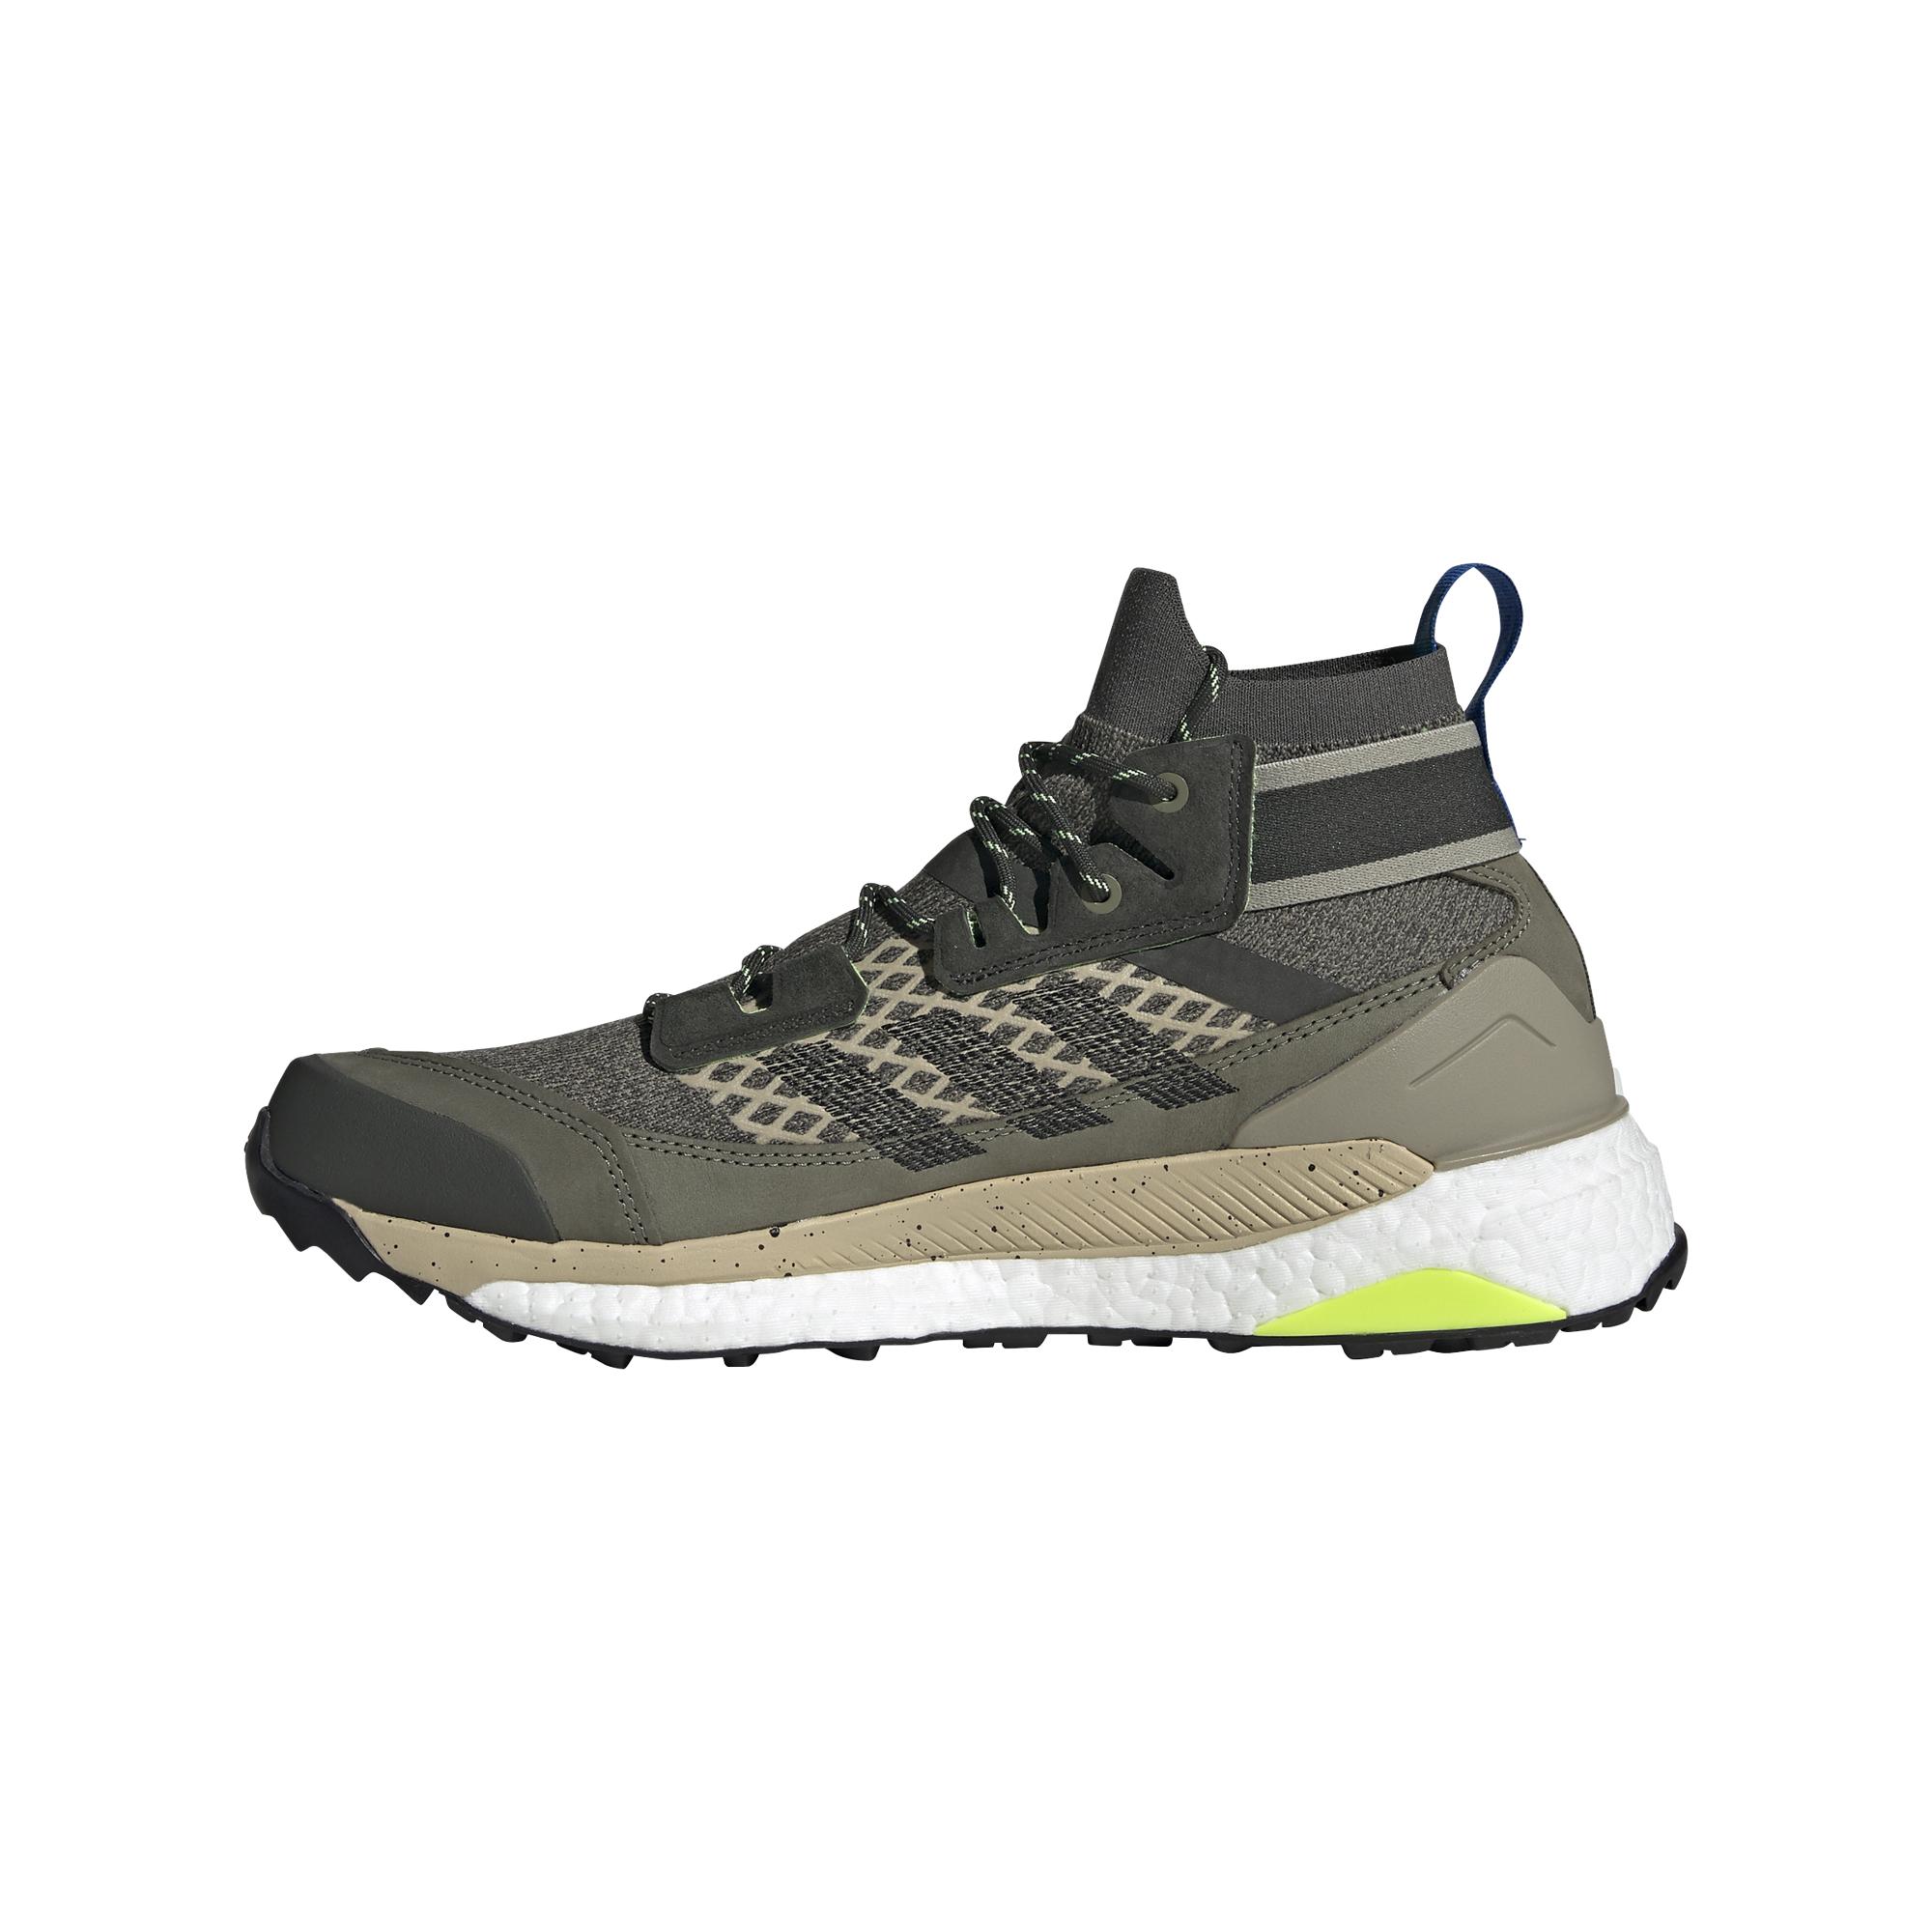 adidas Terrex Free Hiker Blue Legend Green/ Core Black/ Signature Green EF0368